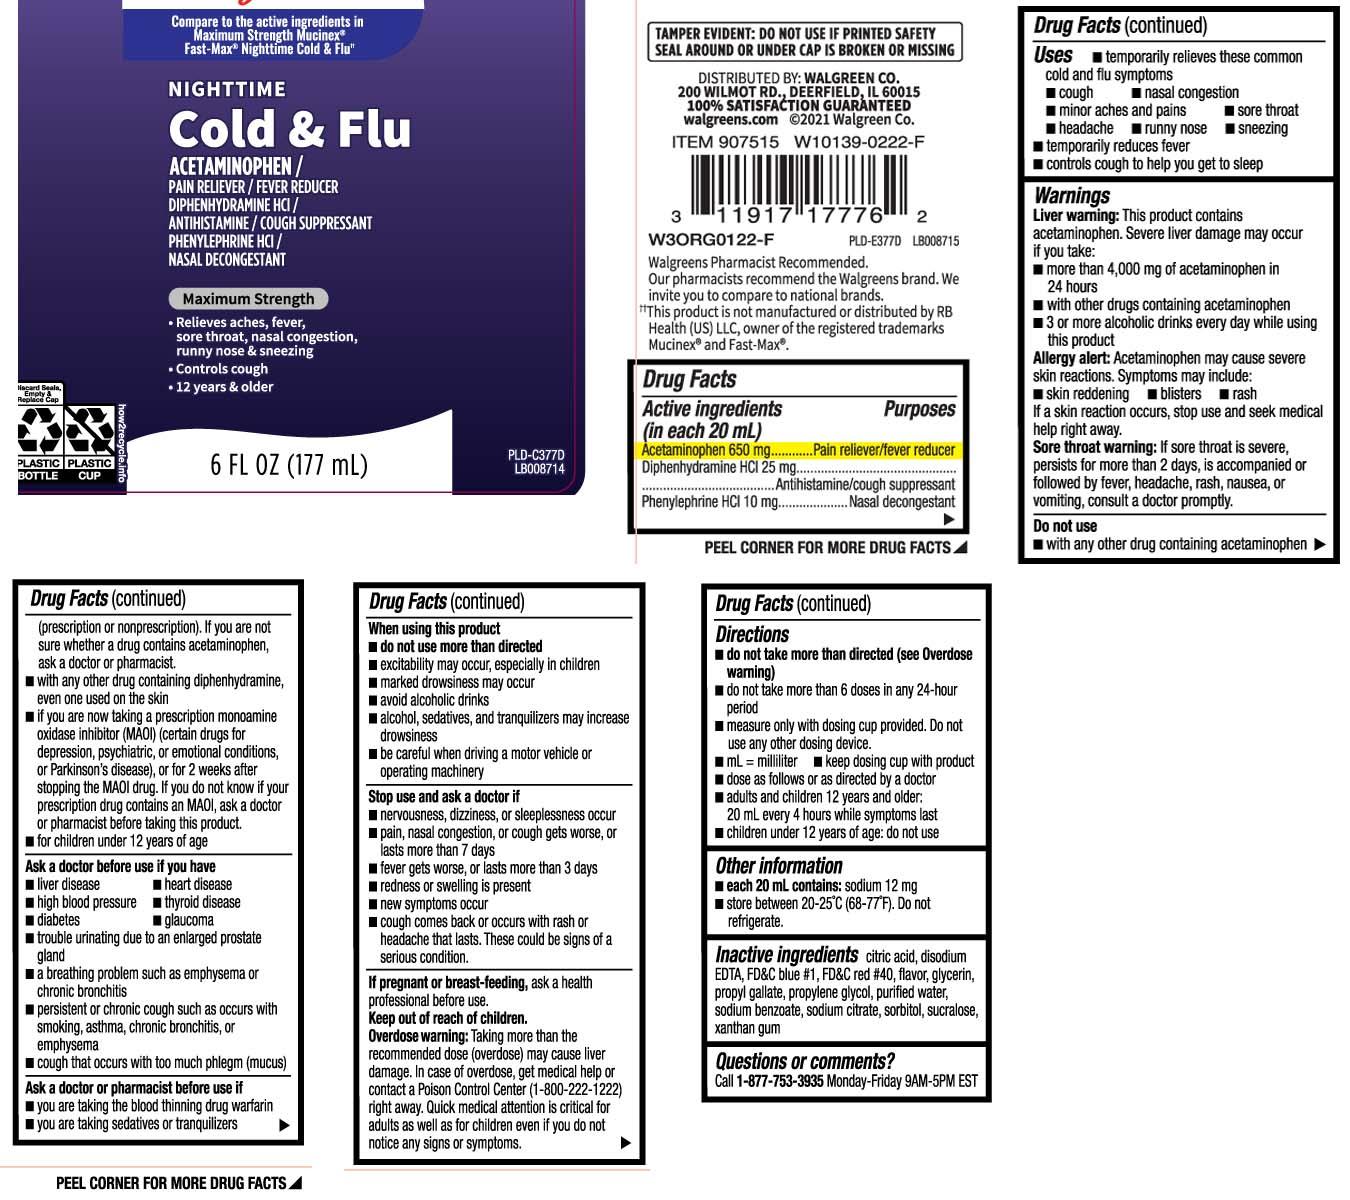 Nighttime Cold And Flu Maximum Strength (Acetaminophen, Diphenhydramine Hci, Phenylephrine Hci) Liquid [Walgreens]